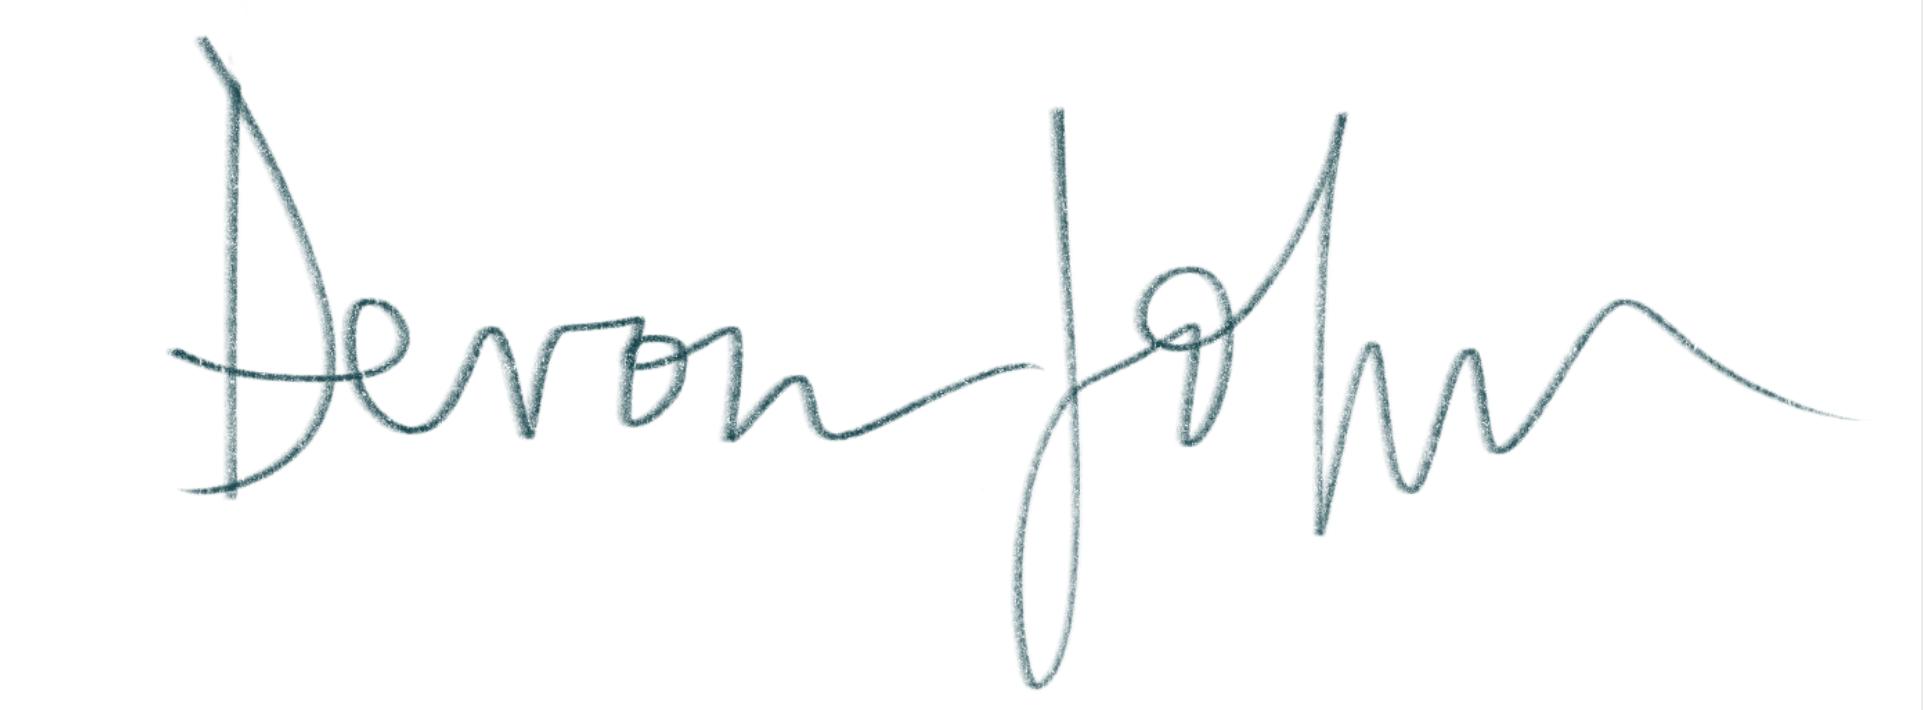 Devon johnson's Signature